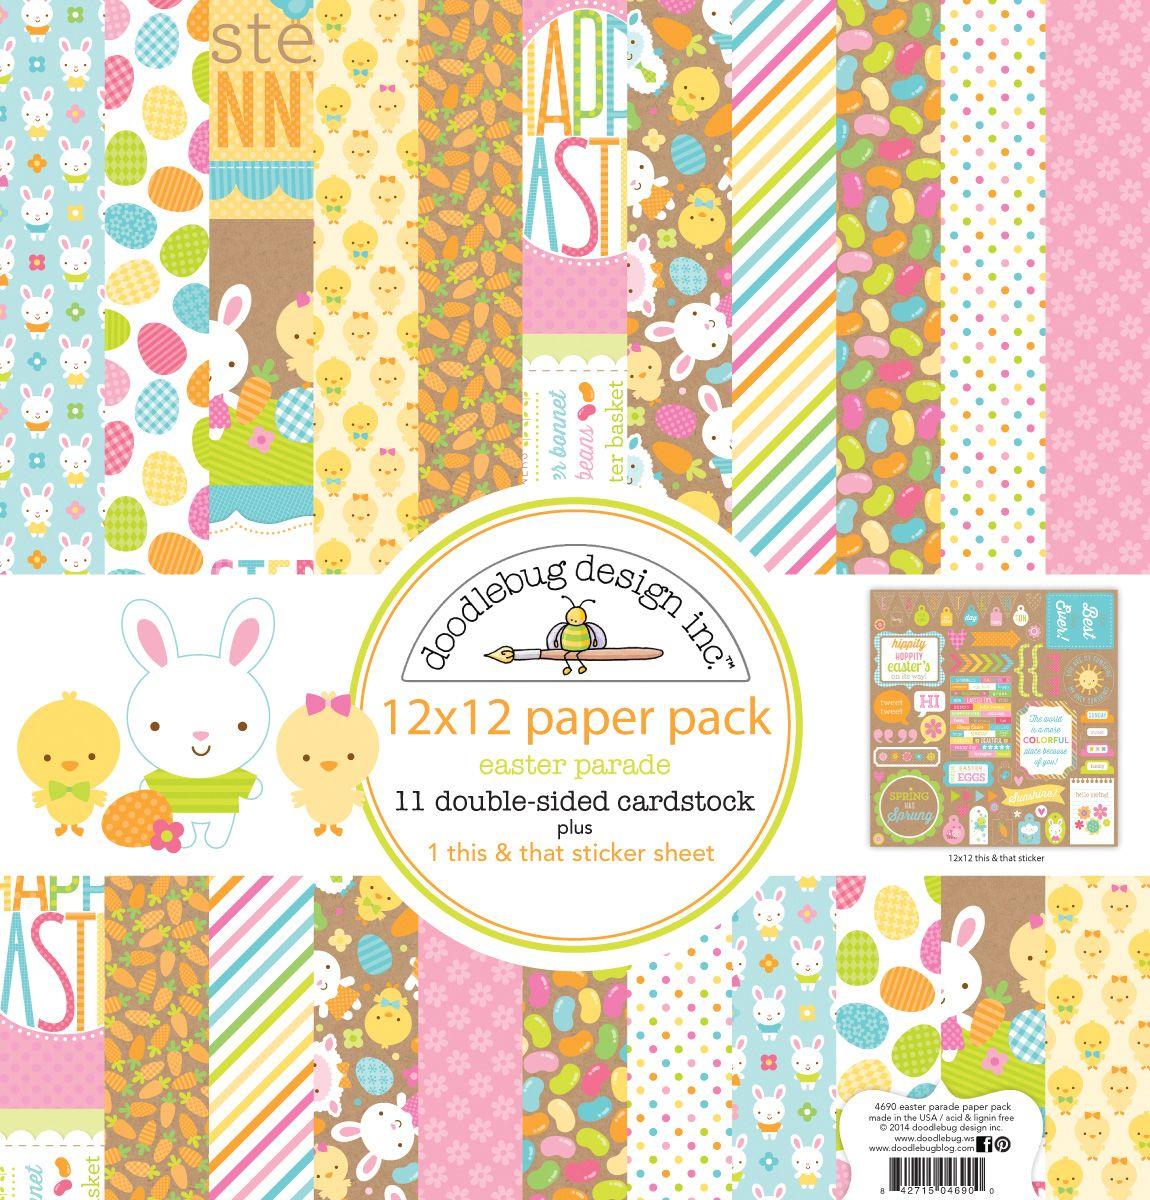 Scrapbook paper collections - Doodlebug Designs Easter Parade 12x12 Easter Scrapbook Paper Pack 11 Main